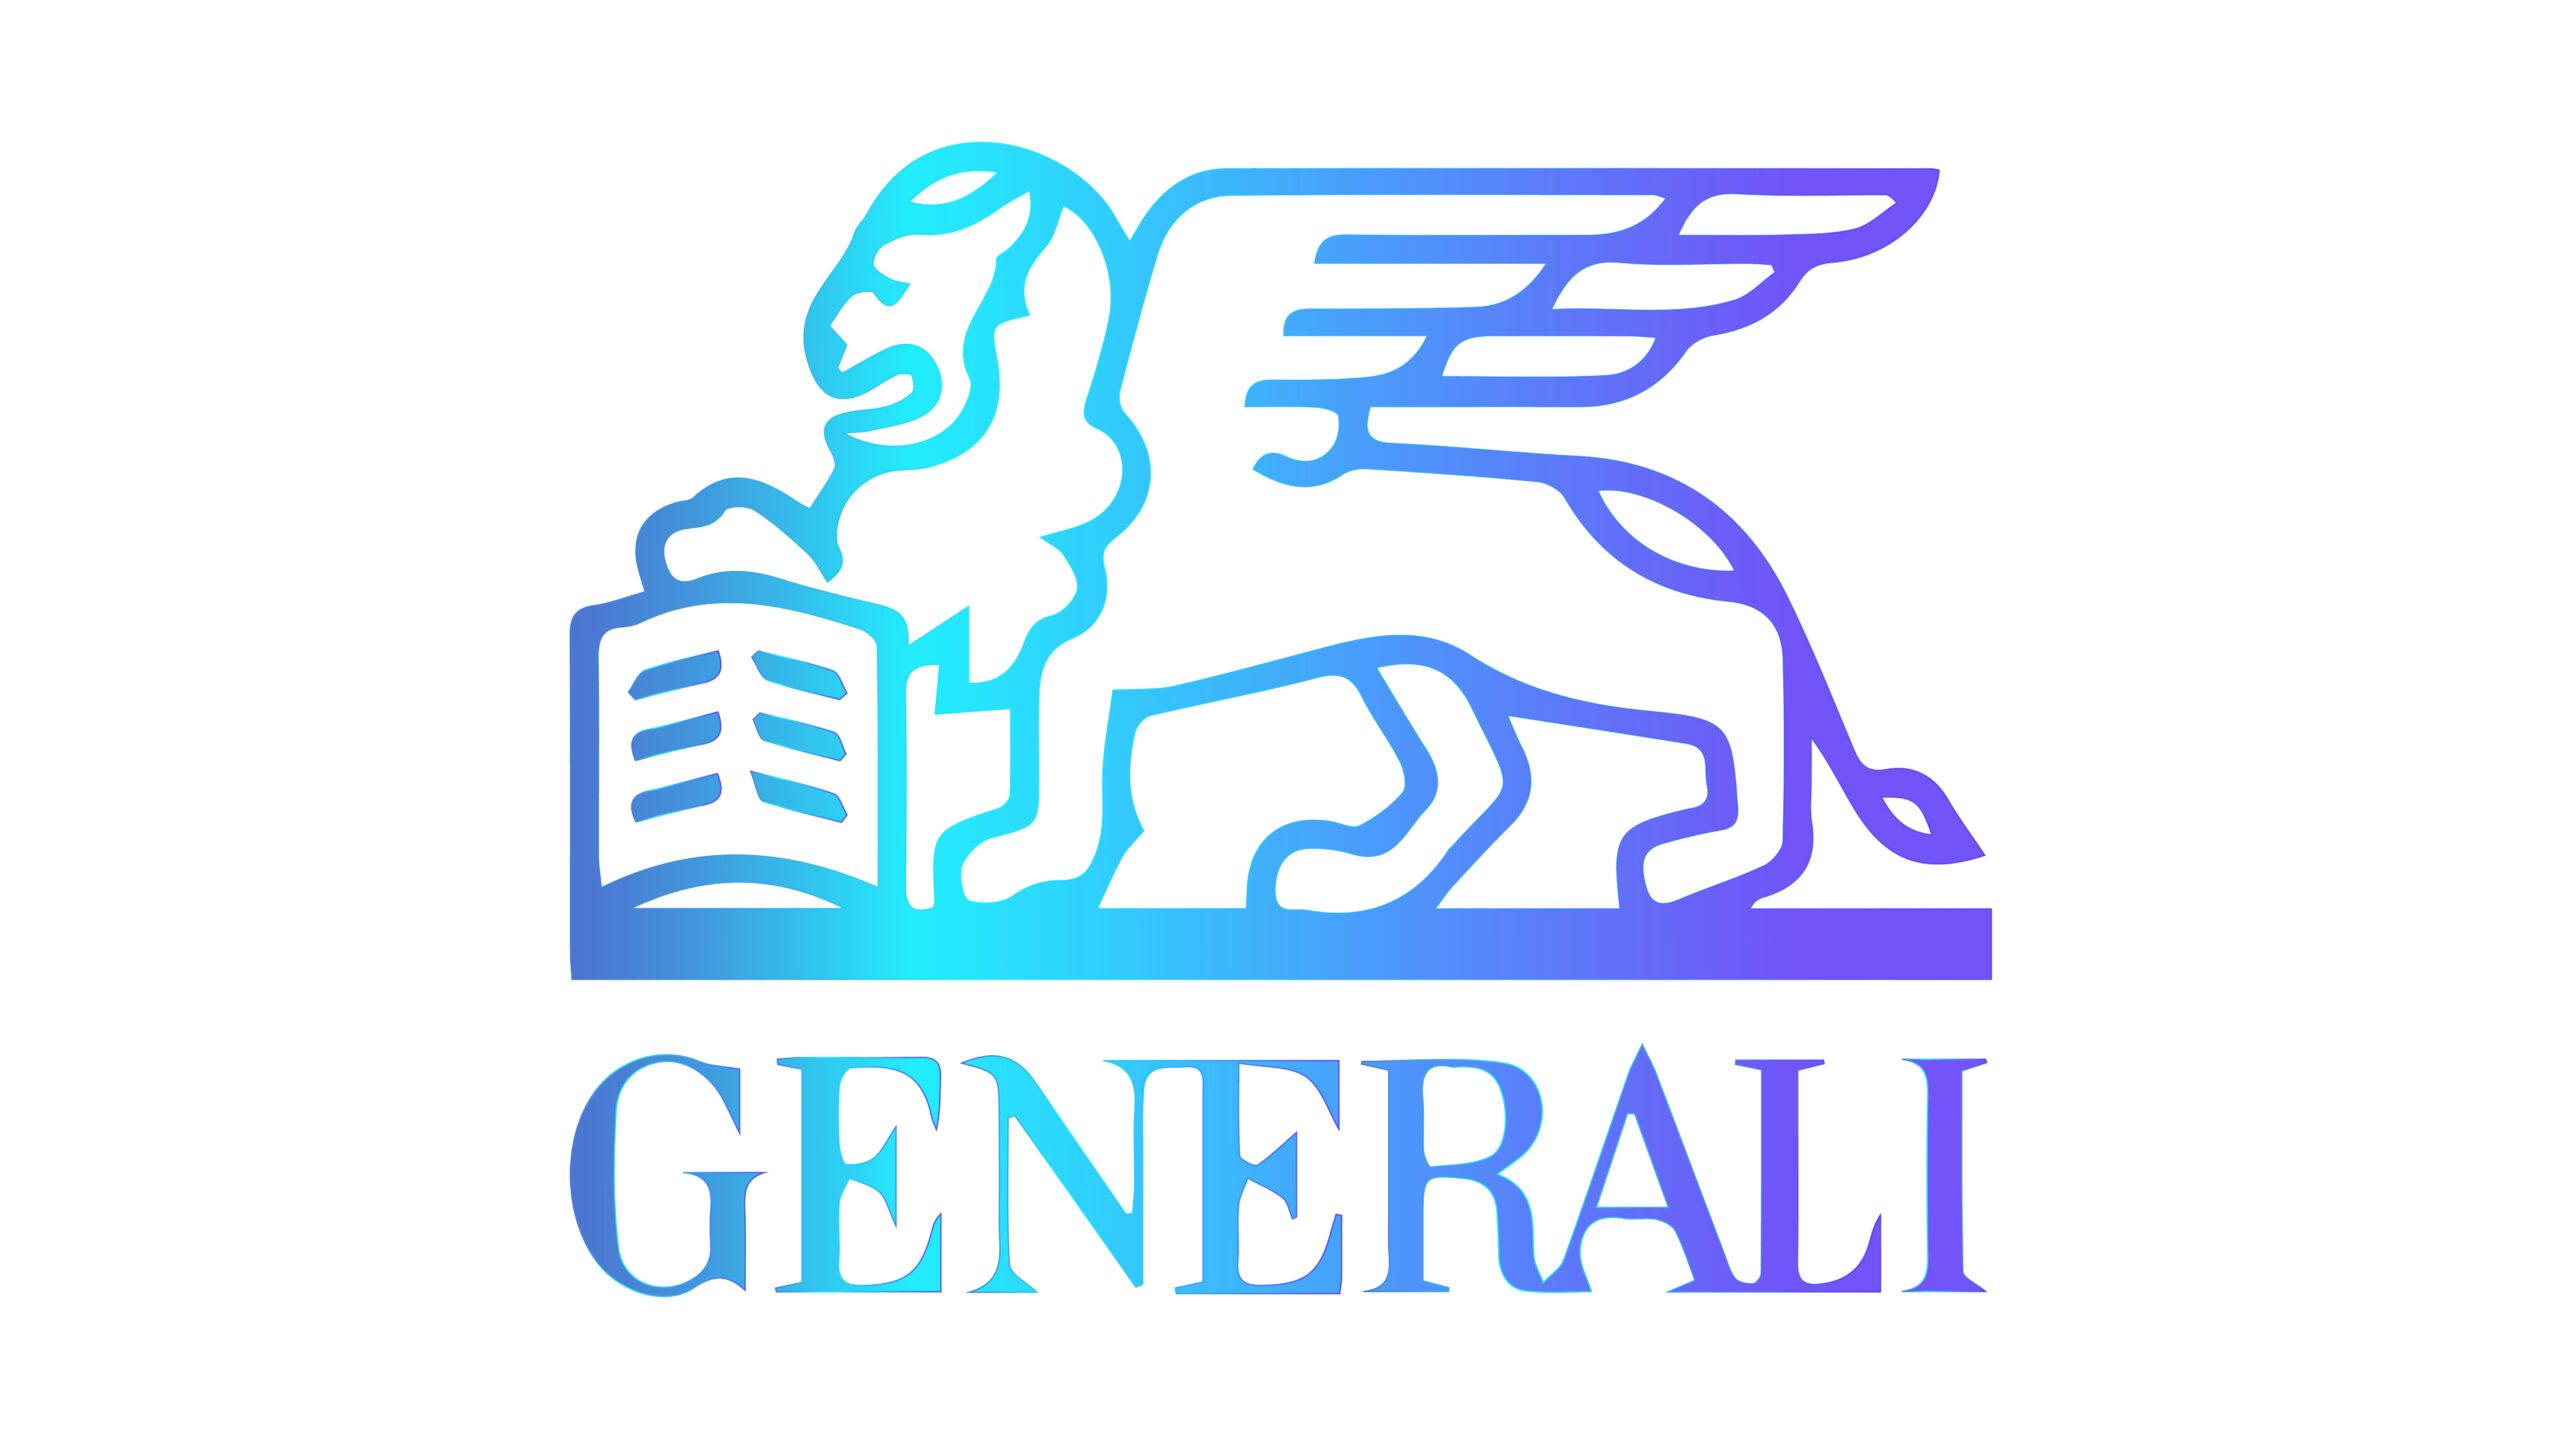 Итальянский Game of thrones с Generali